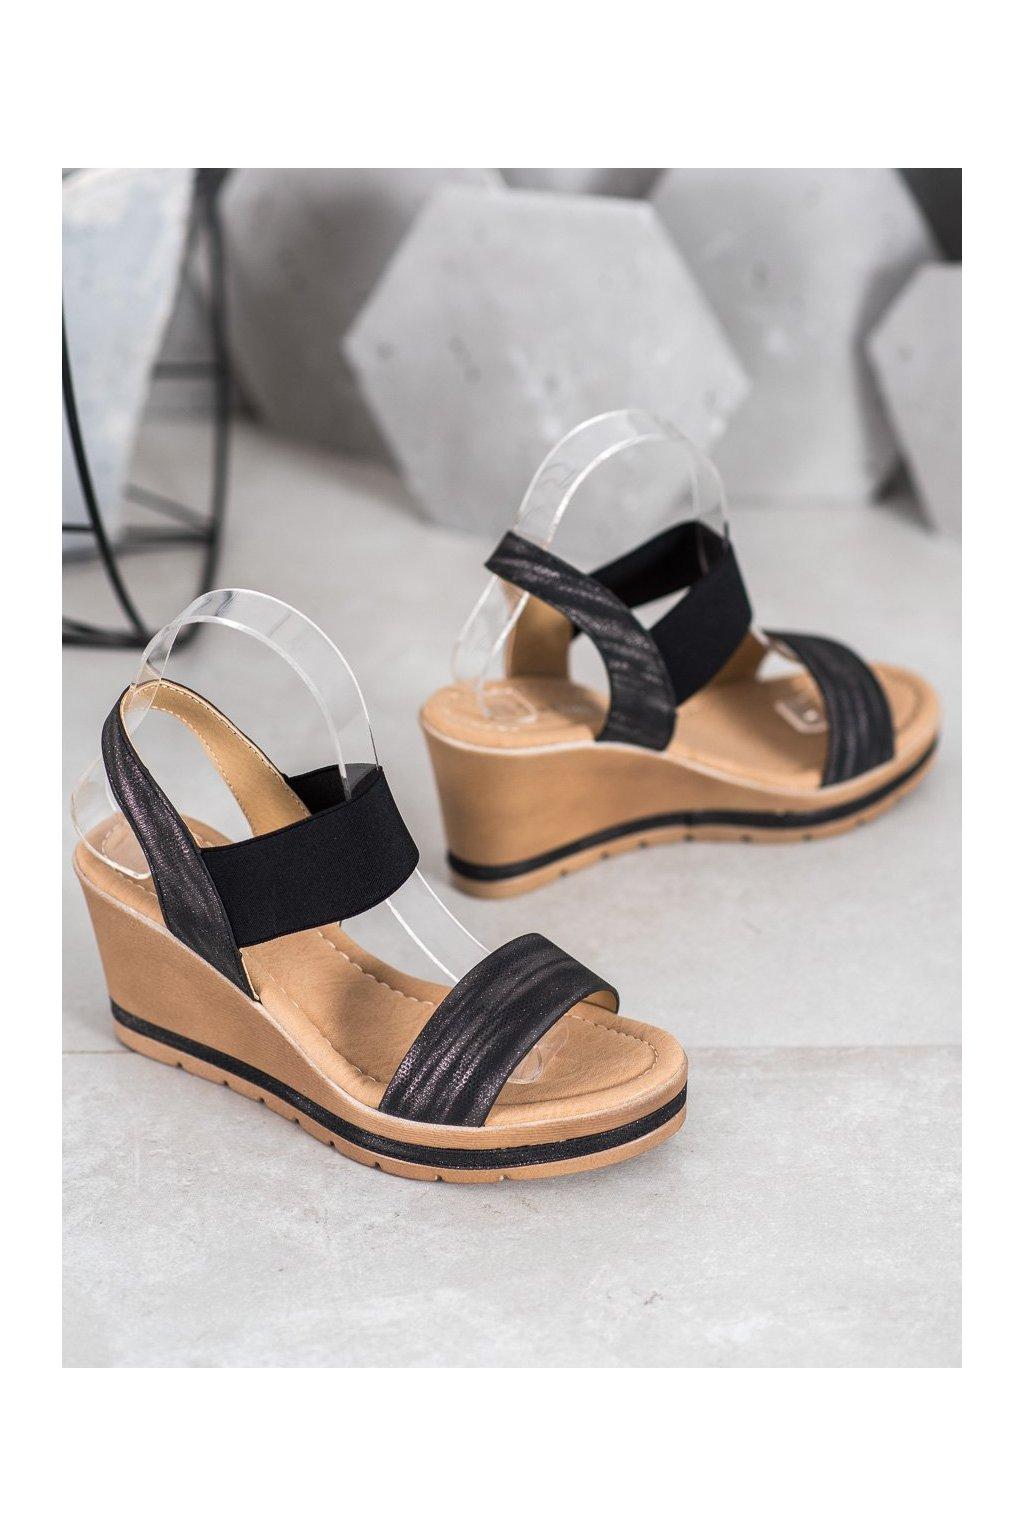 Čierne sandále Sea elves kod 6436B